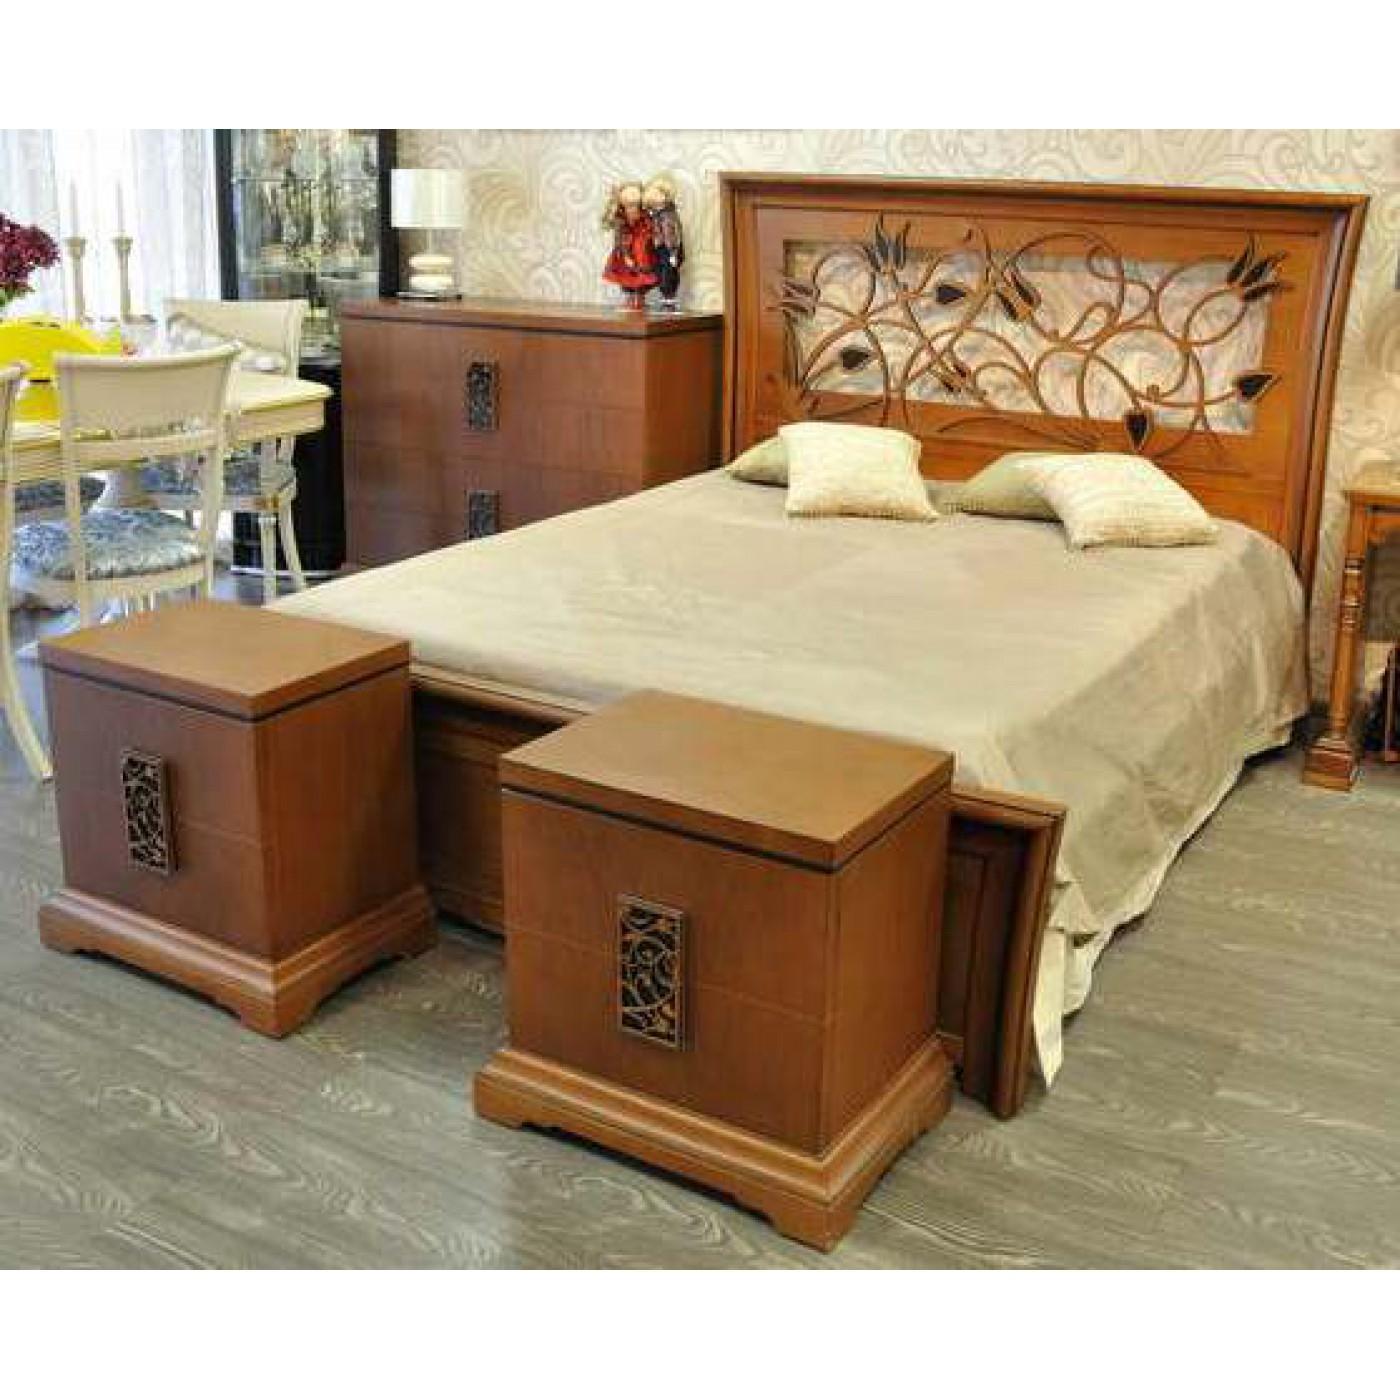 Nicol спальный гарнитур